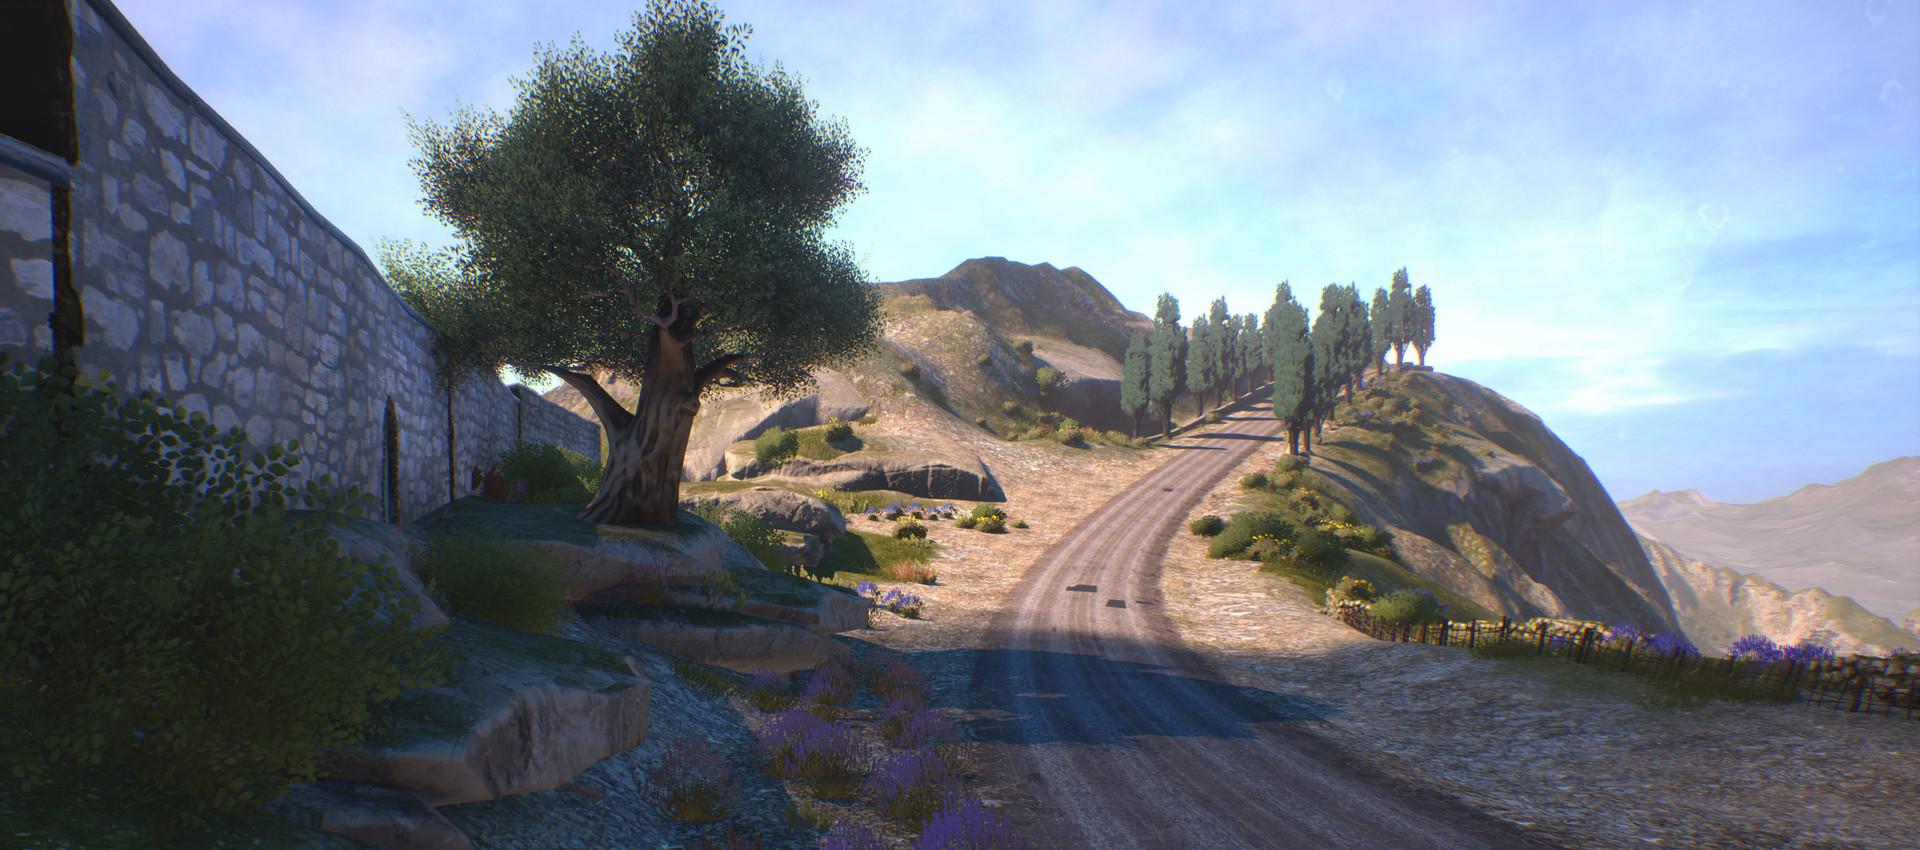 Florian thomasset european valley 14